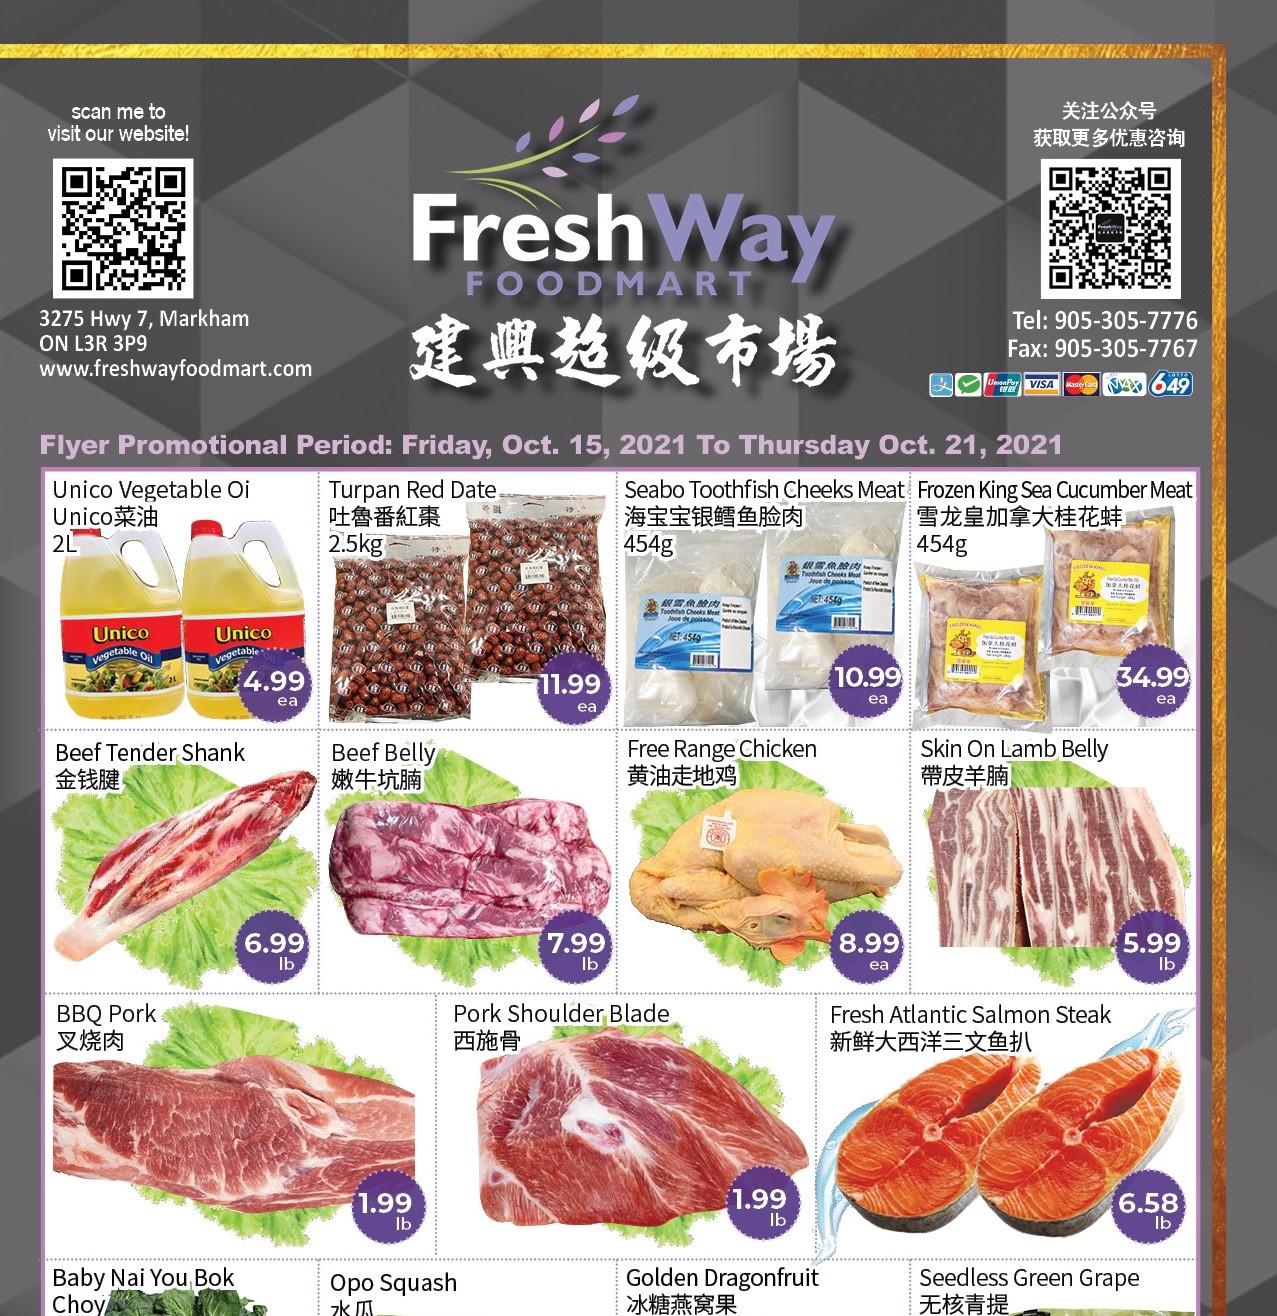 FreshWay Foodmart Flyer   Oct 15